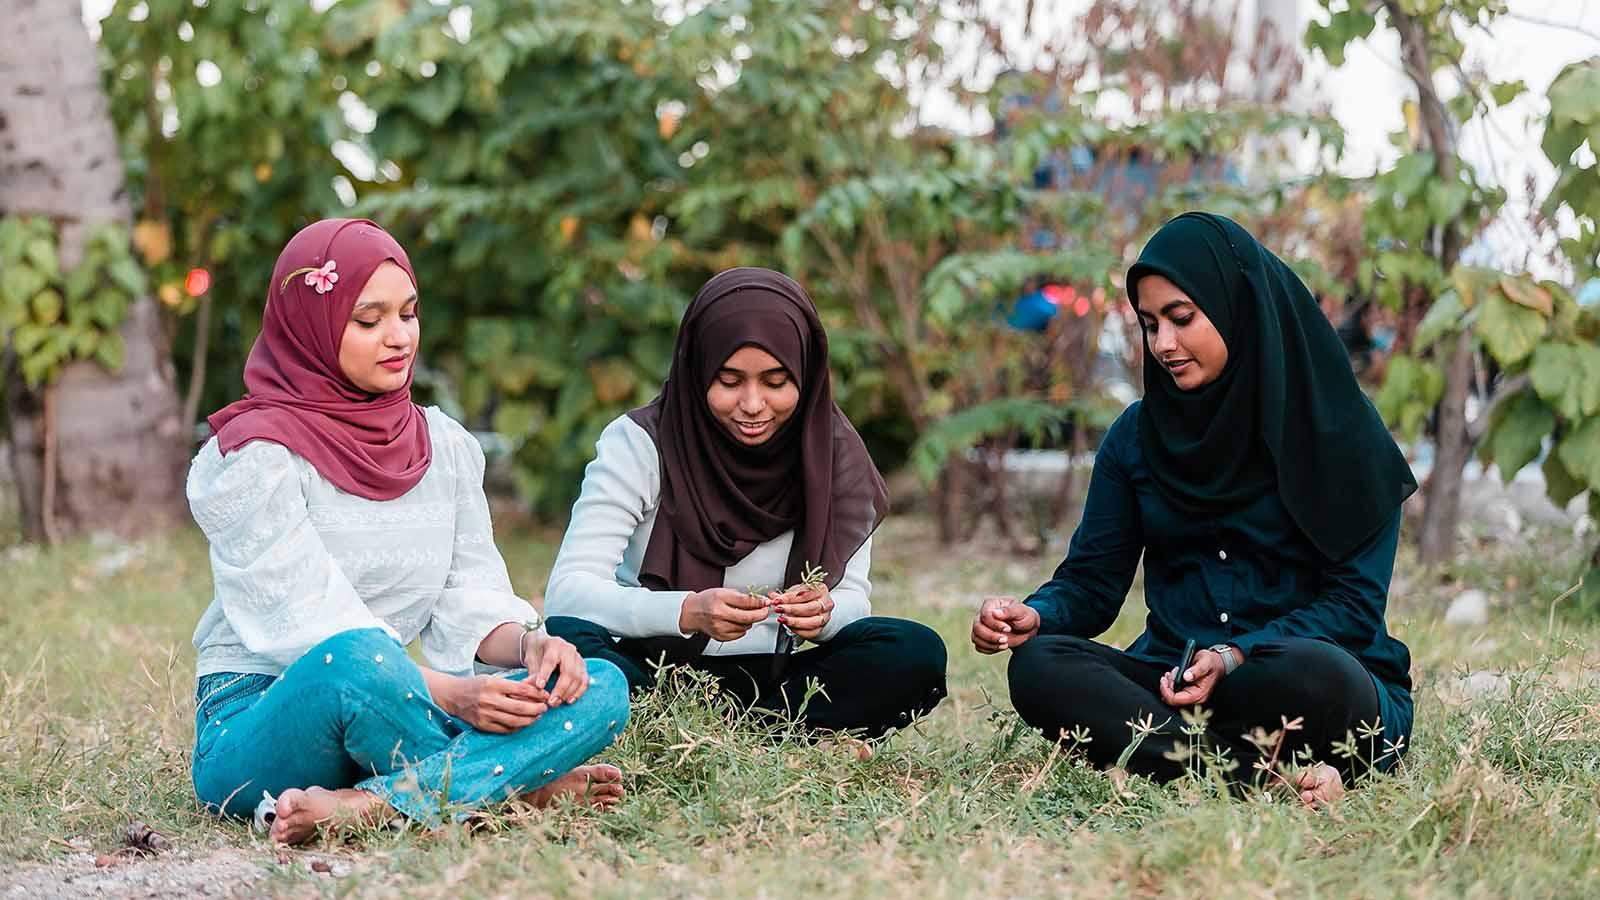 Muslim girls sitting in a field.